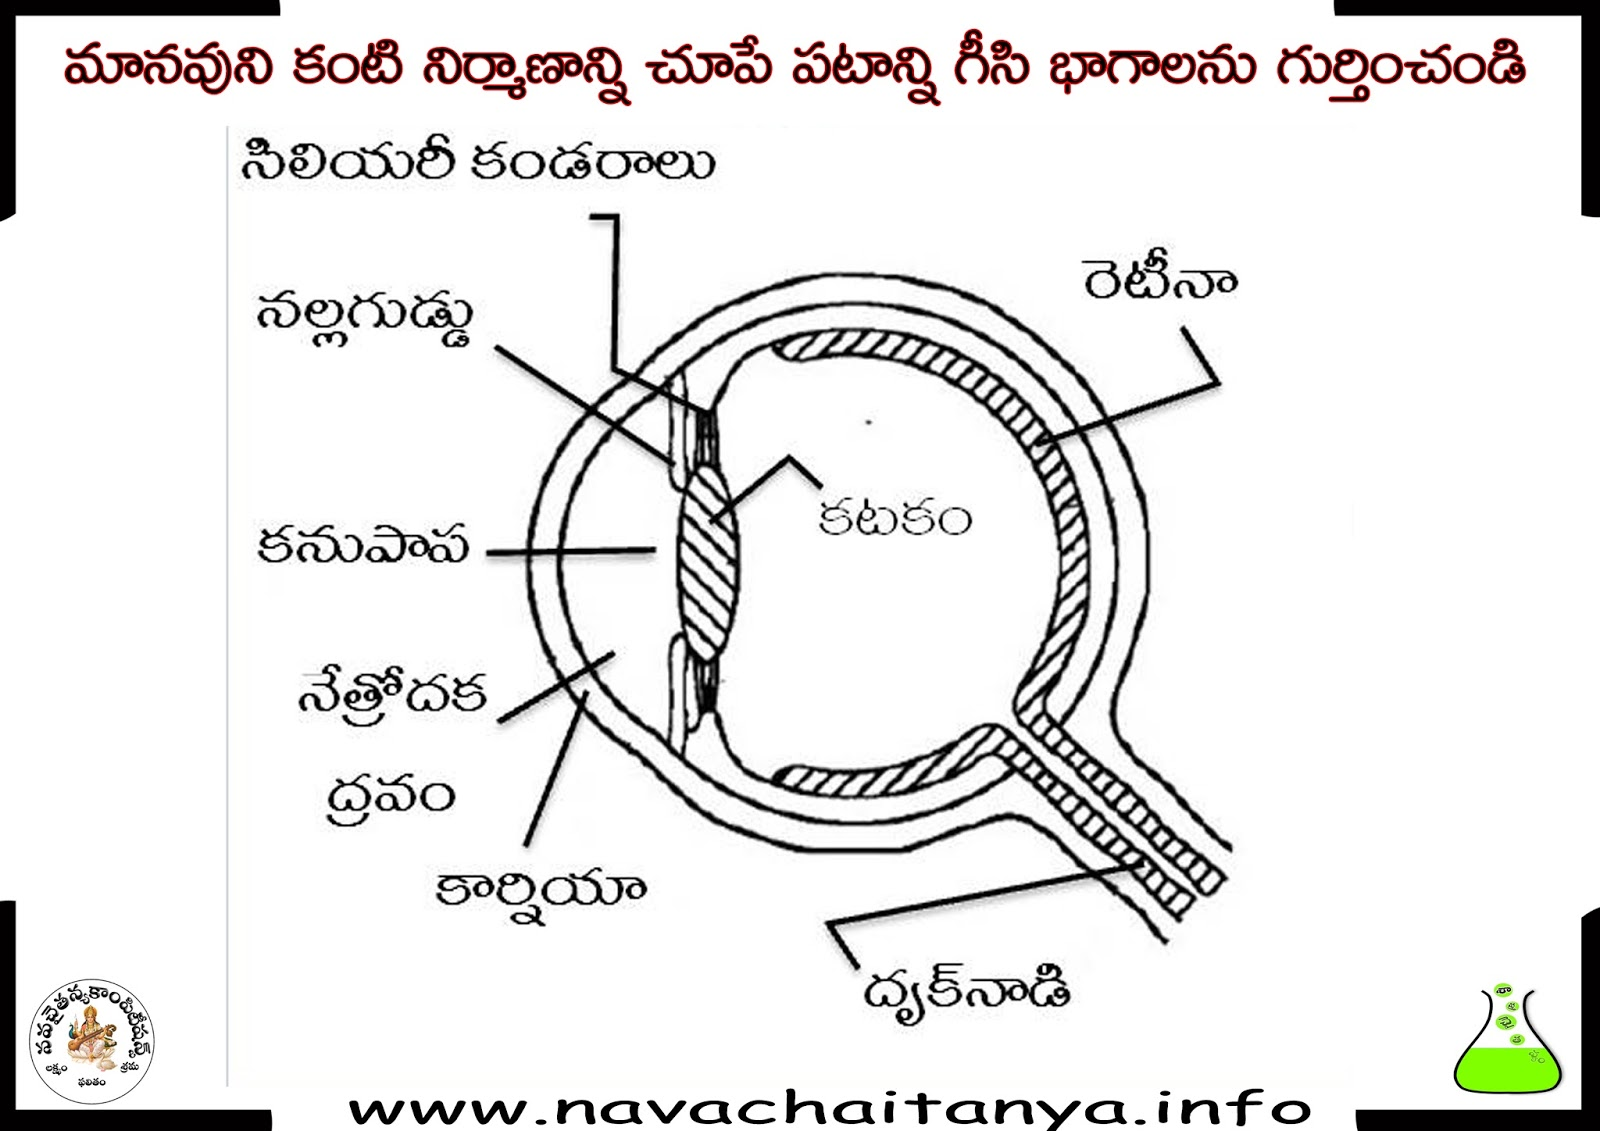 10th class physical science diagrams   u0c2e u0c3e u0c28 u0c35 u0c41 u0c28 u0c3f  u0c15 u0c02 u0c1f u0c3f